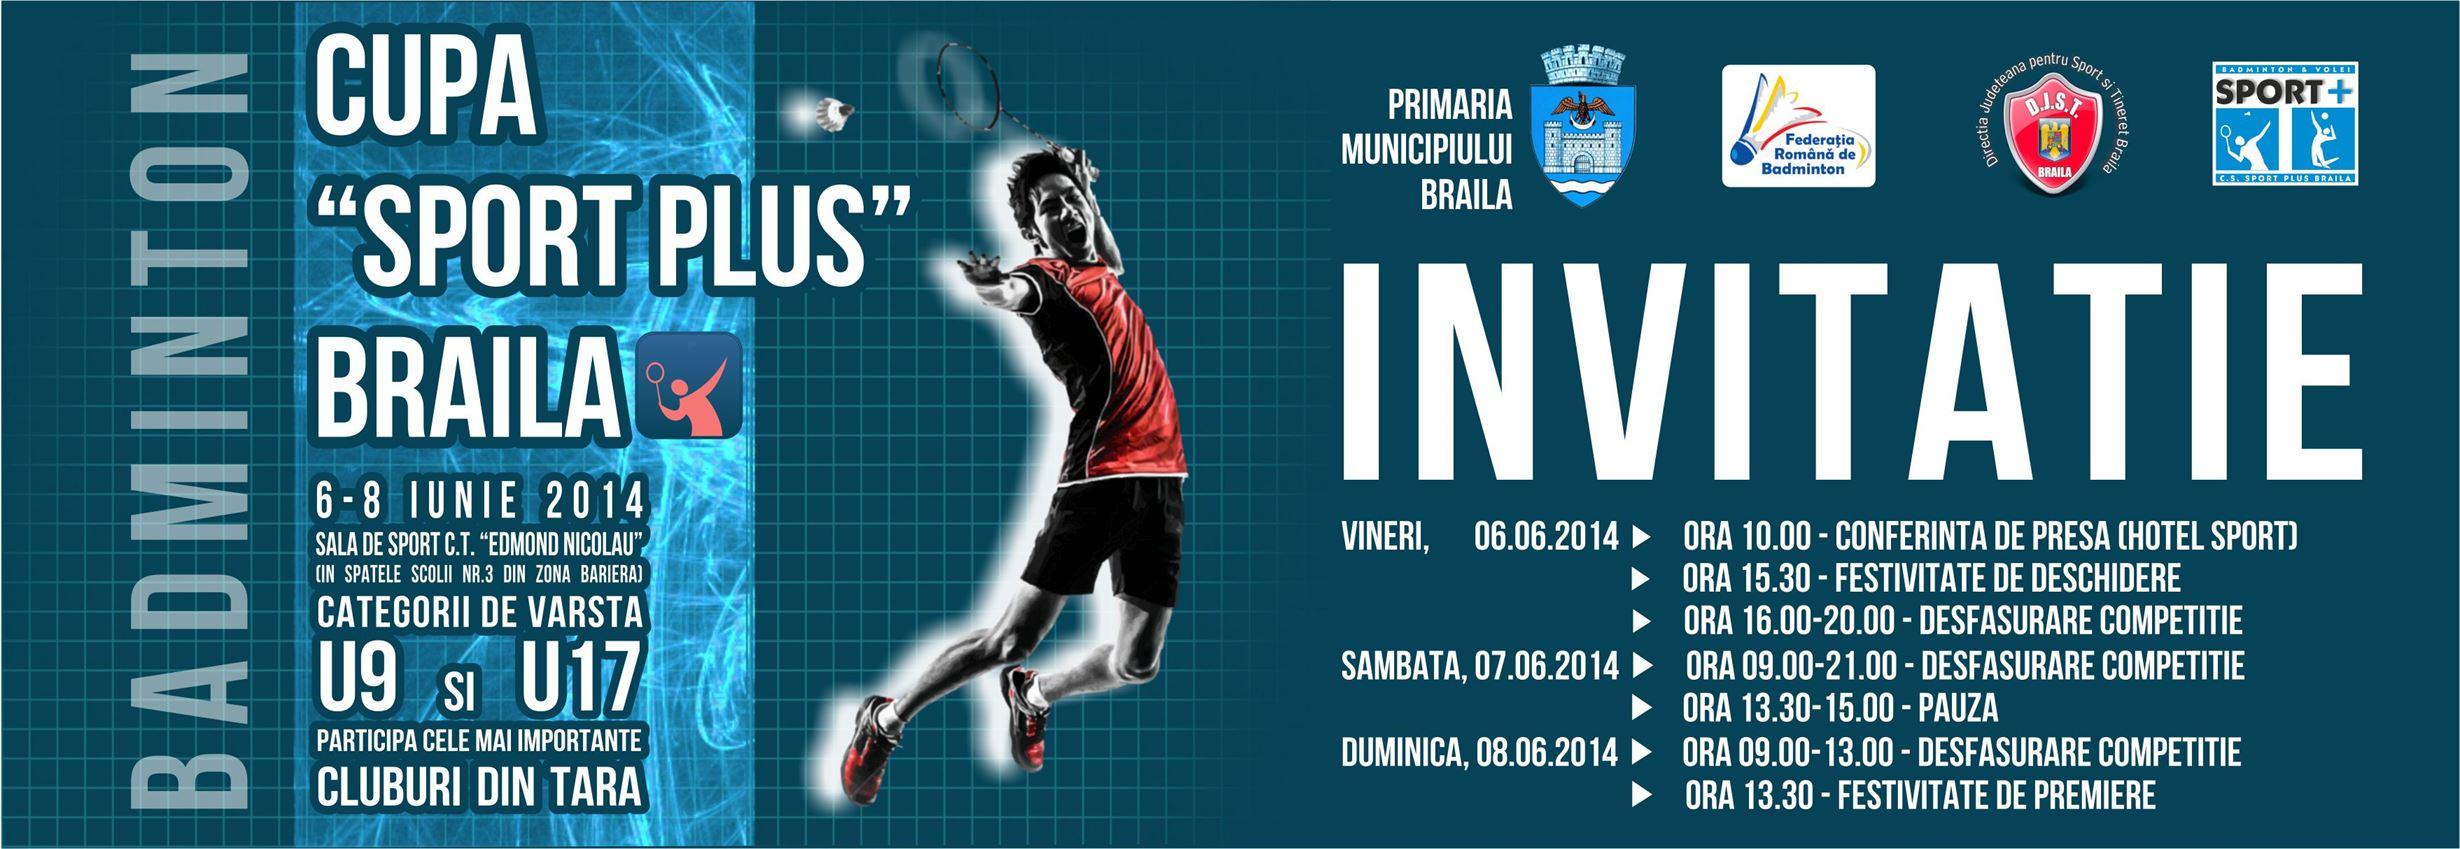 Competitie nationala de badminton la Braila